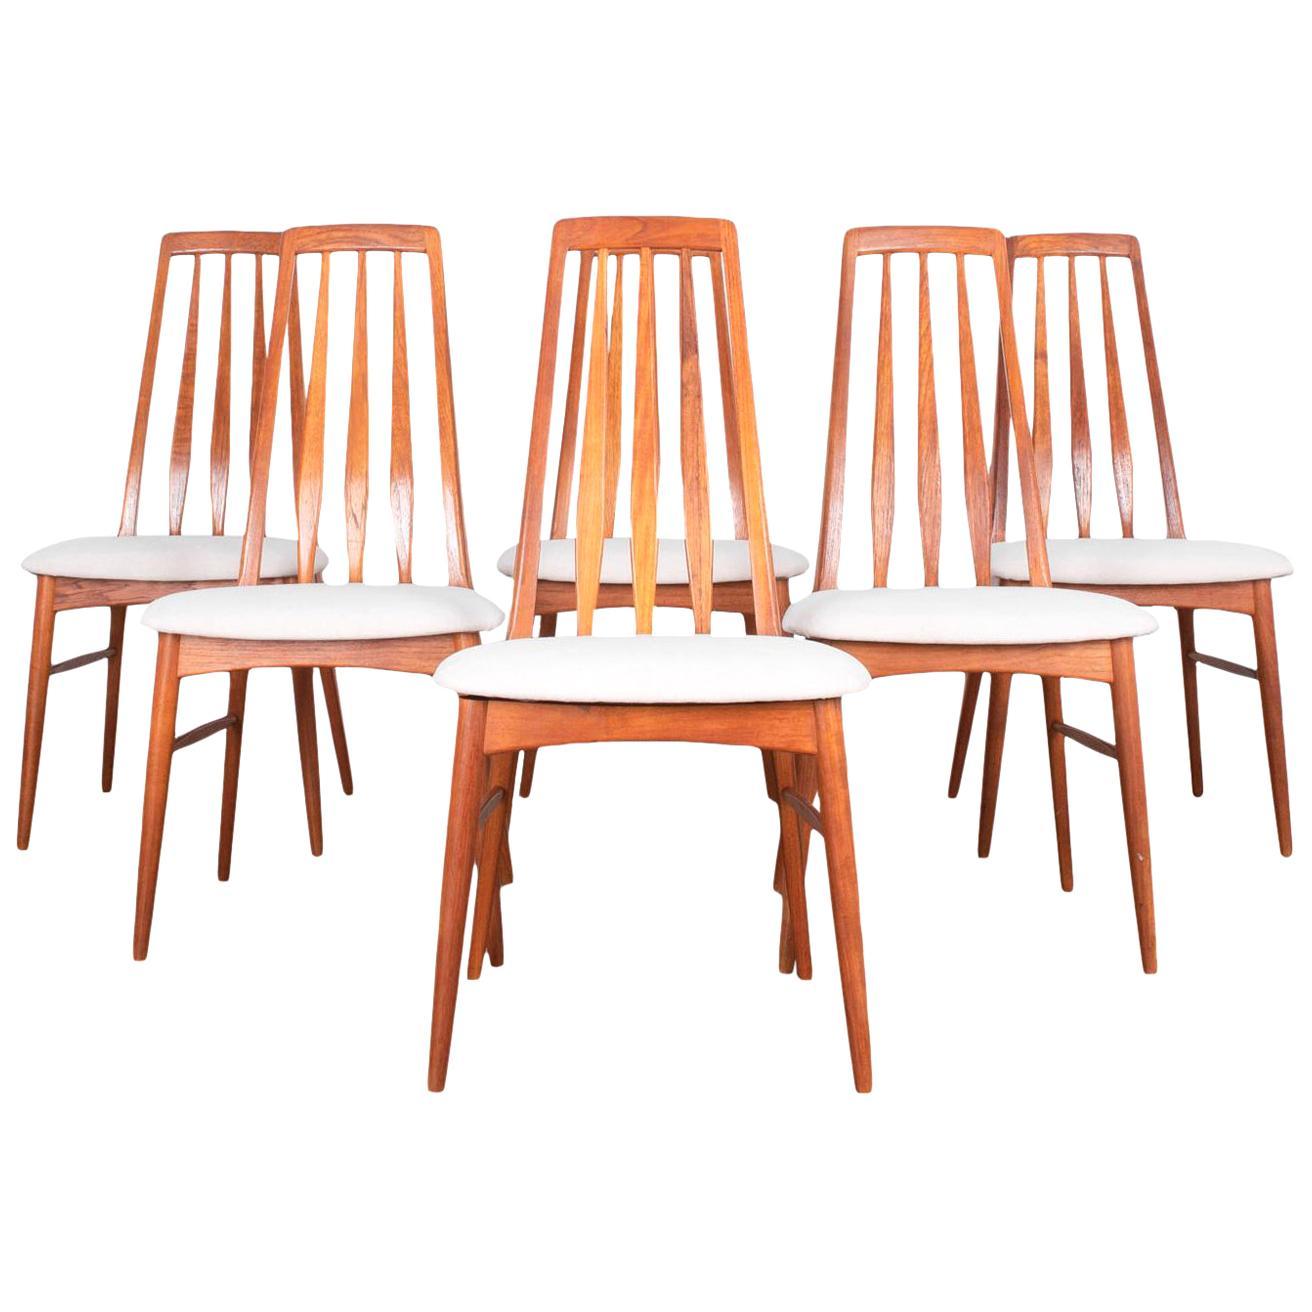 Niels Koefoed Mid-Century Modern Dining Chairs, Set of 6